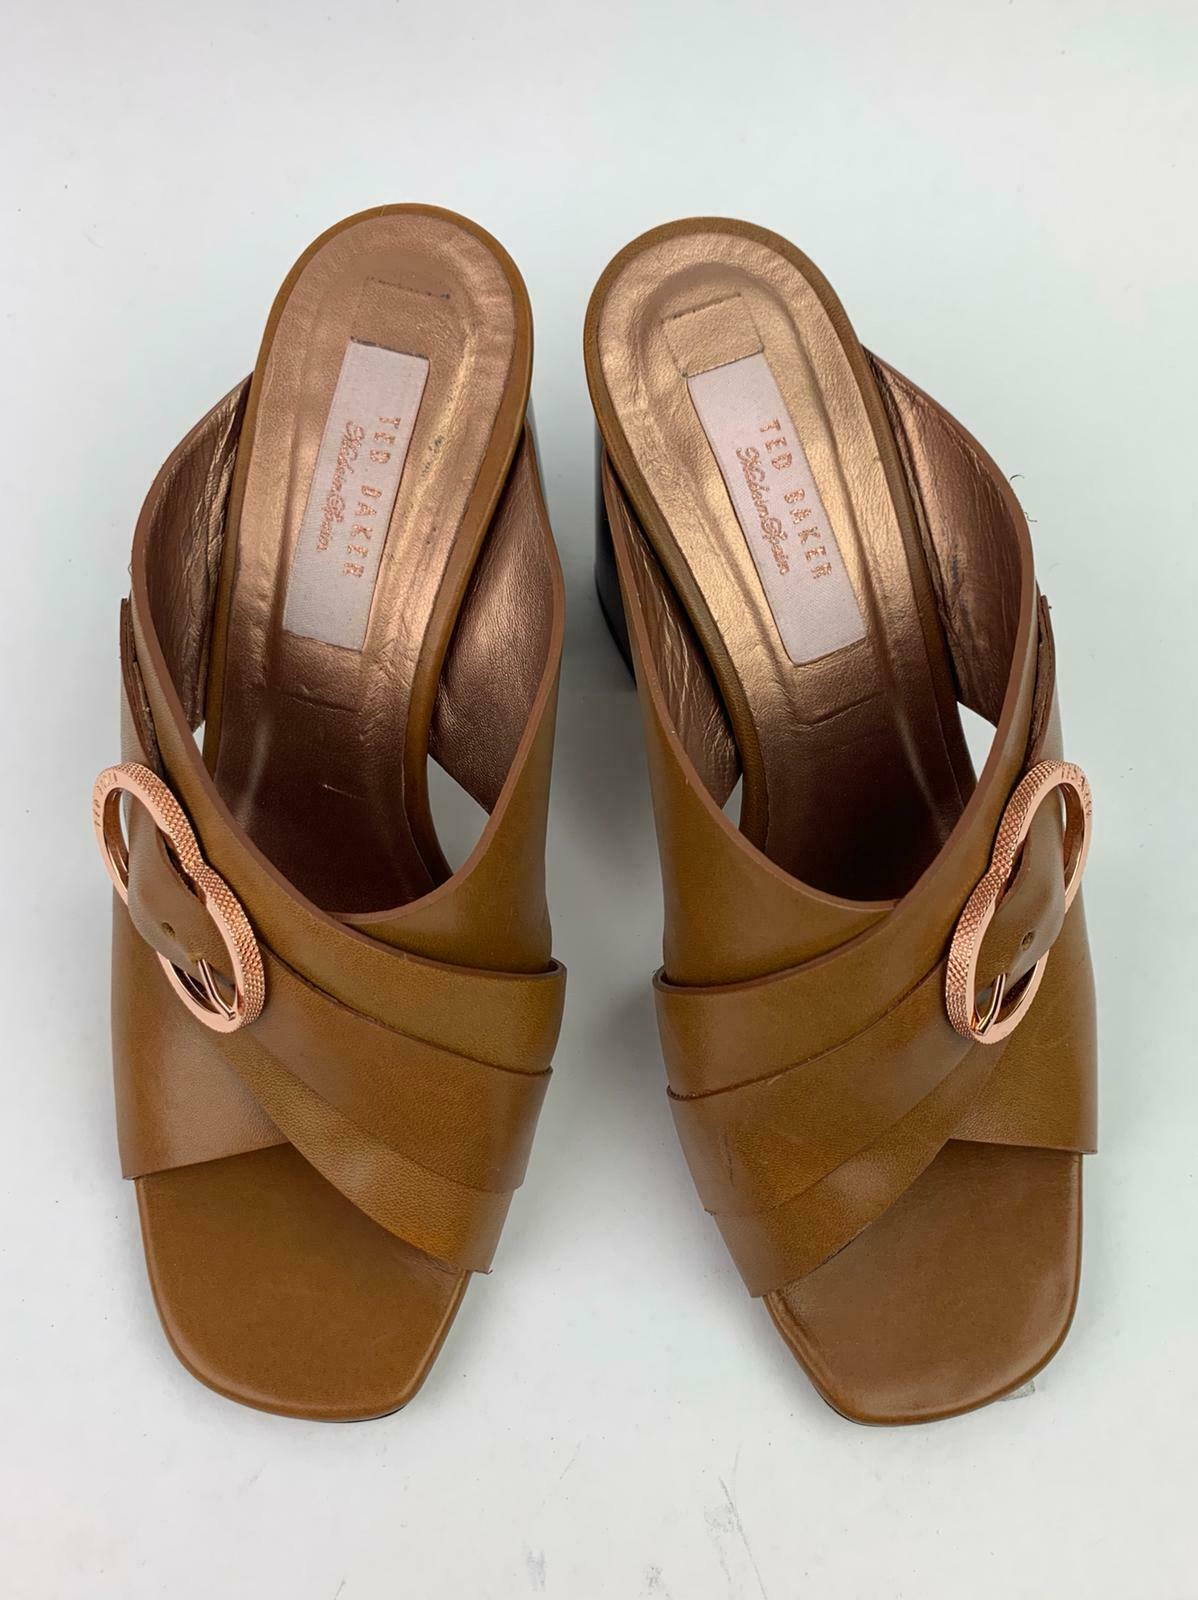 Ted Baker London Maladas Leather Patterned Block Heel Mule Sandal sz 36.5